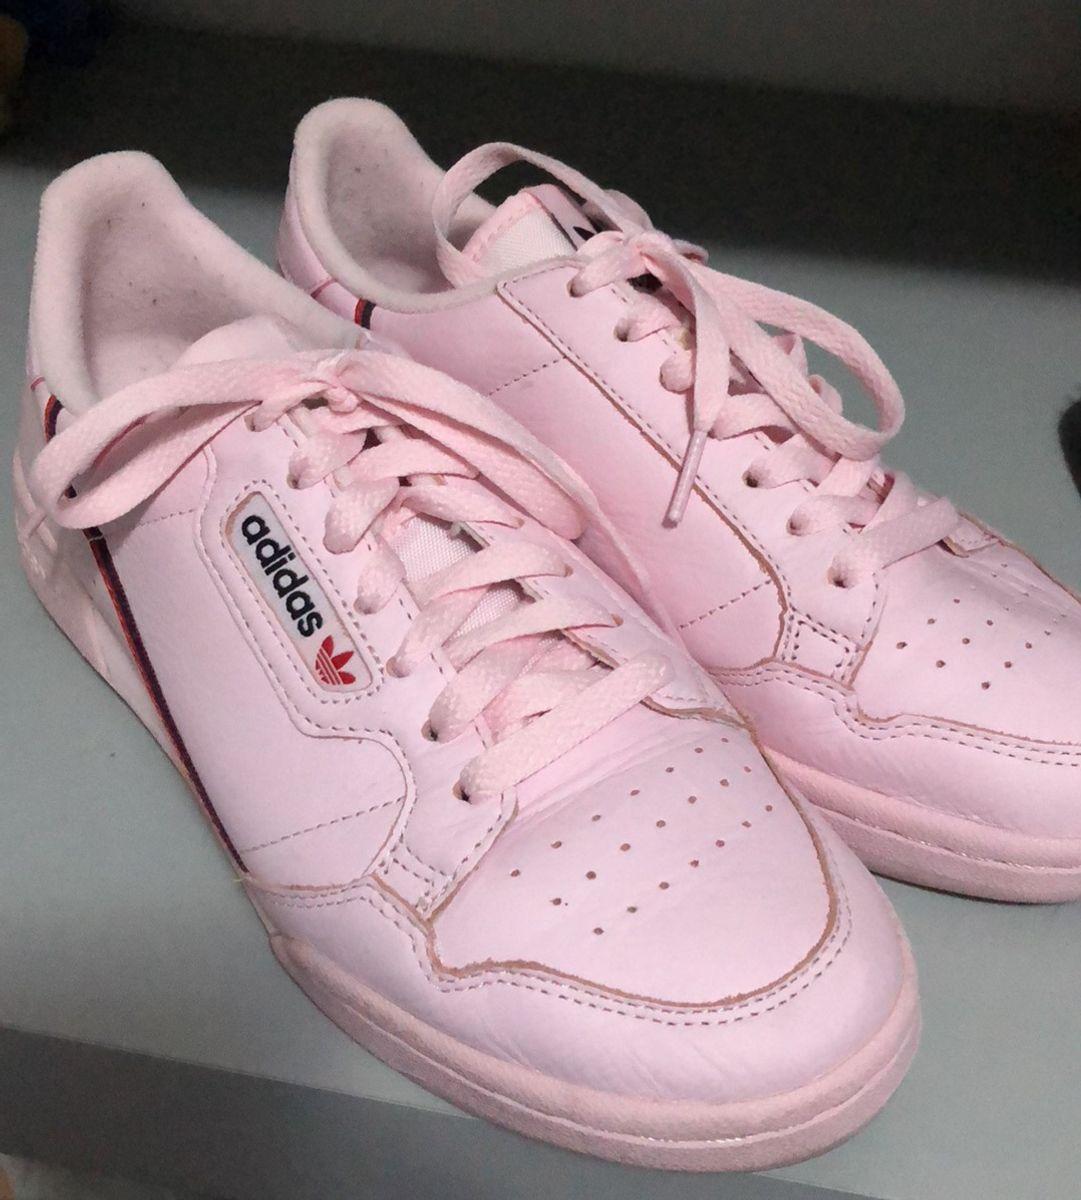 5be9e40fbc6 adidas rascal continental 80 rosa bebê - tênis adidas